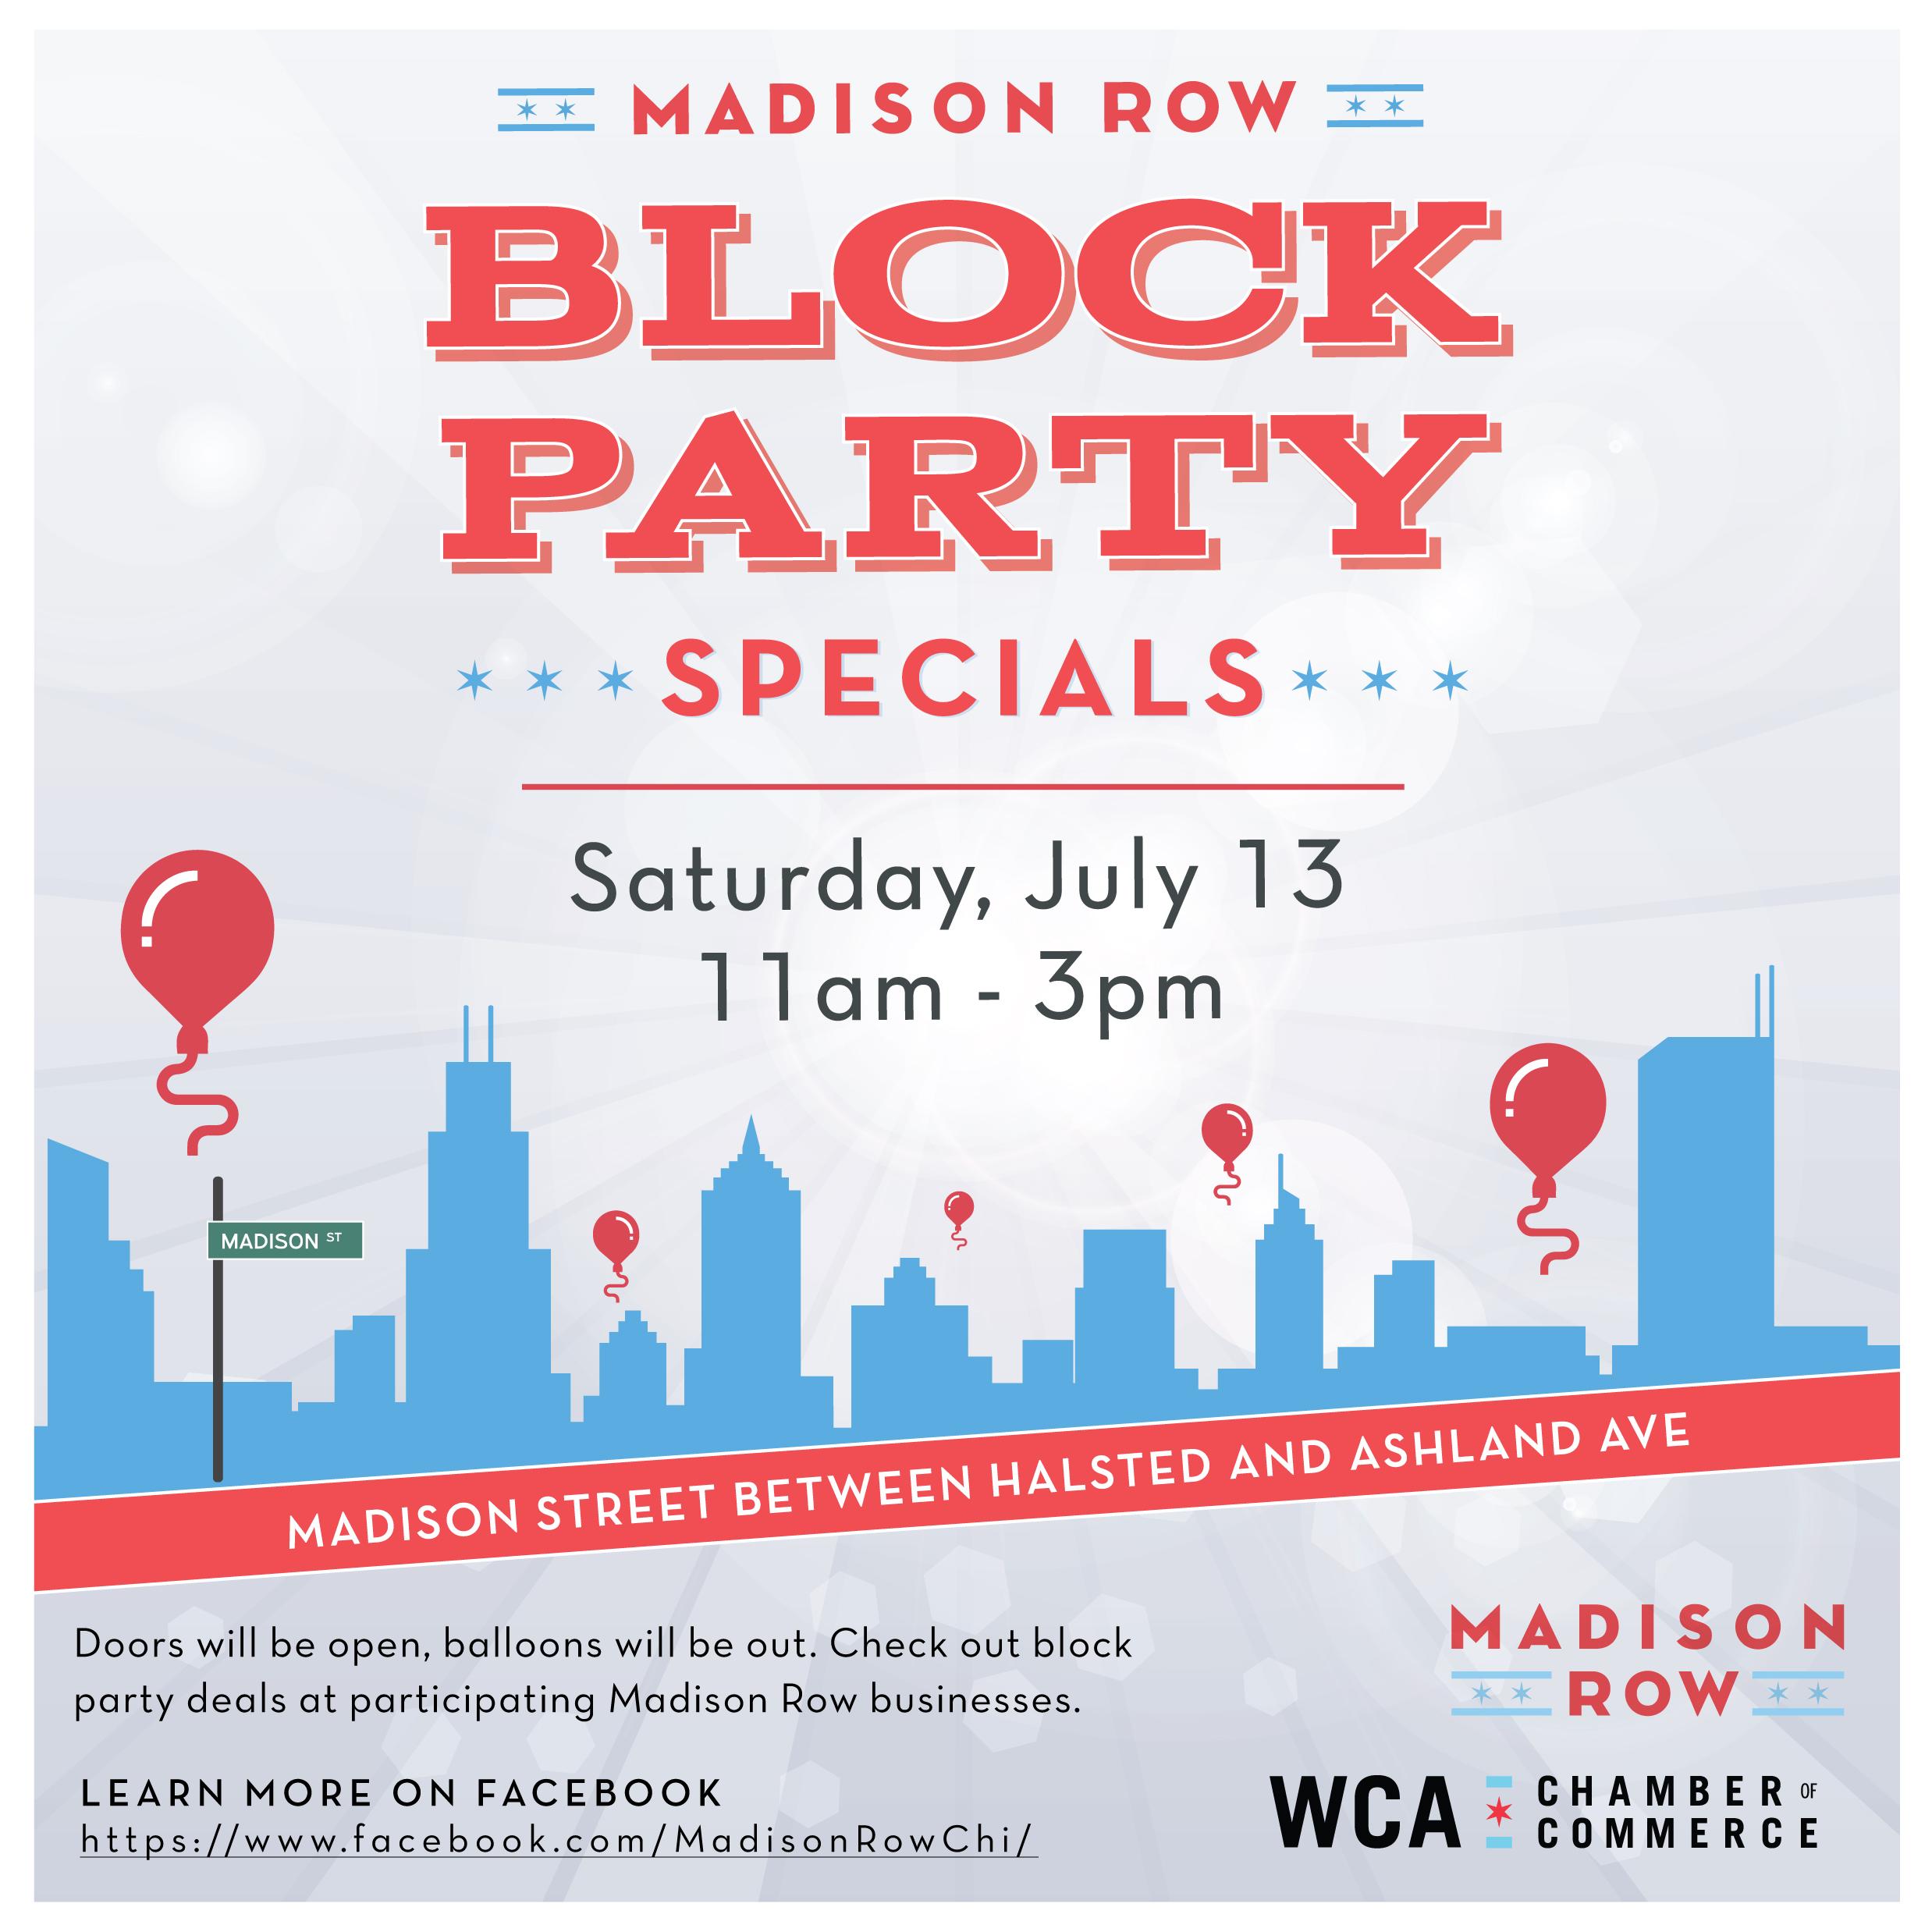 2019 Madison Row Saturday Events_BLOCKPARTY6-25__INSTAGRAM POST.jpg